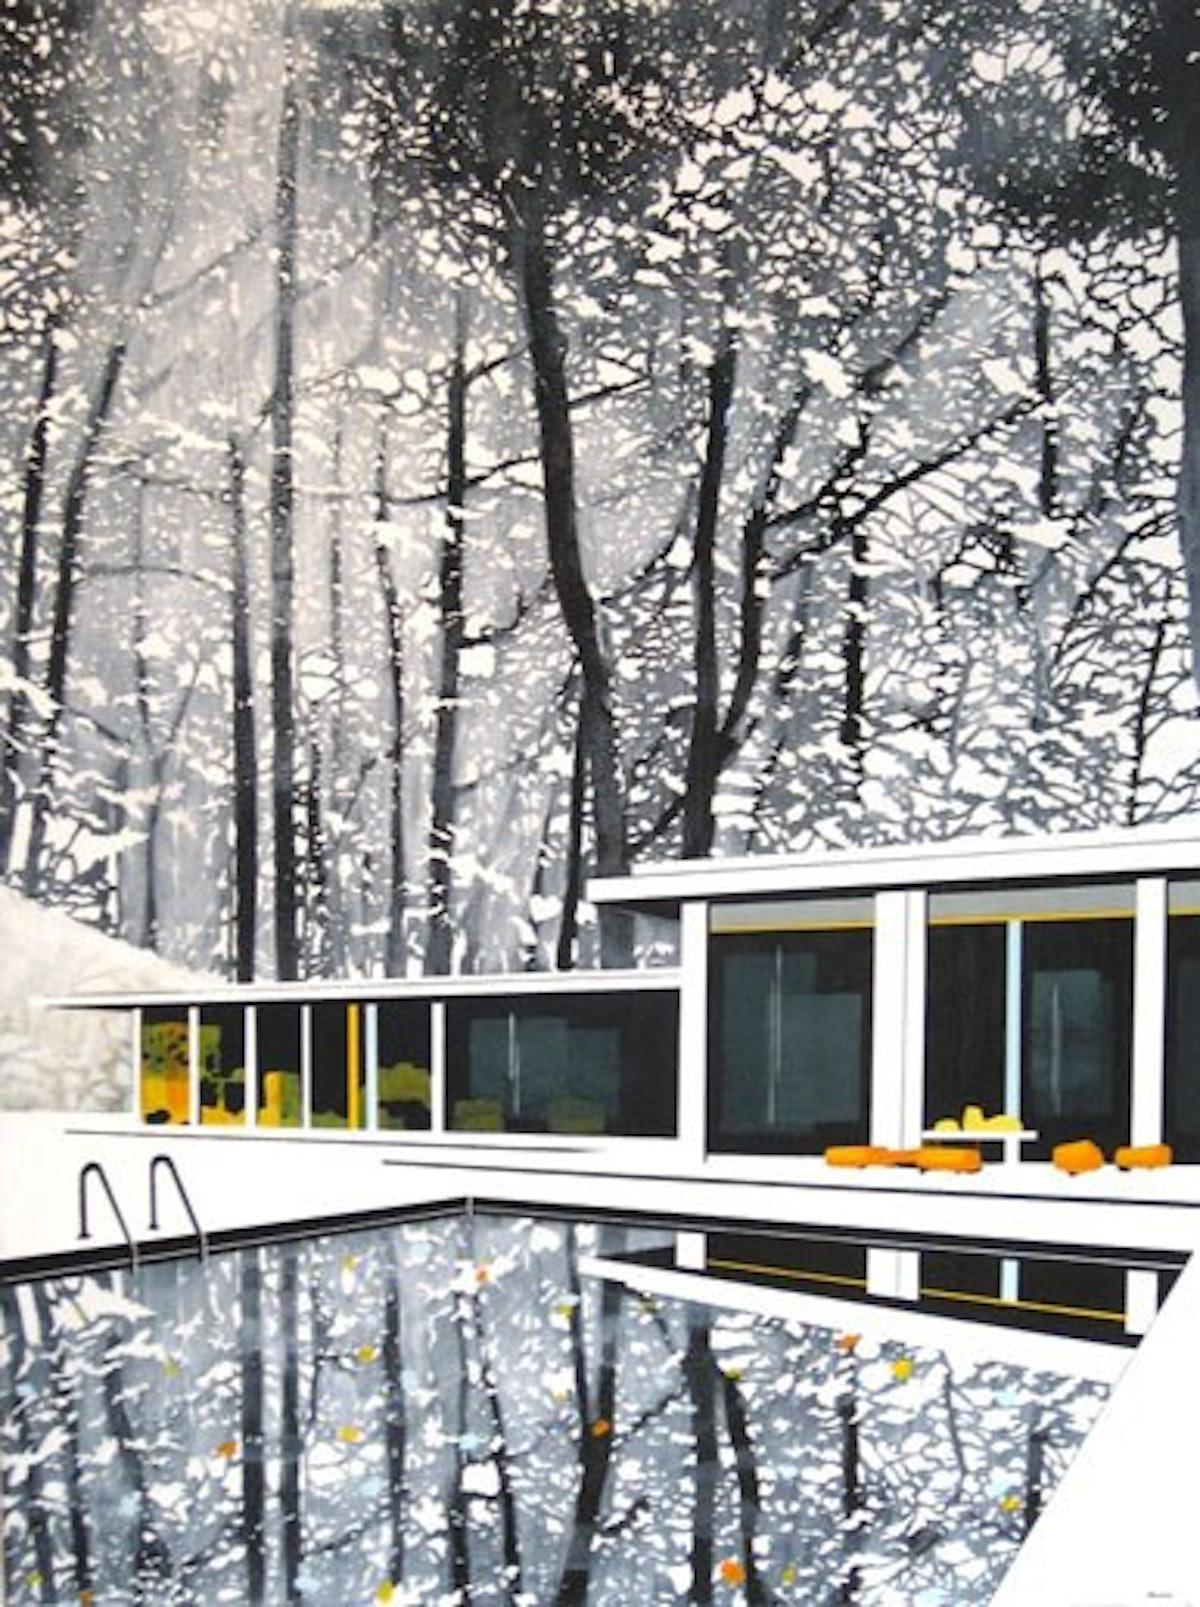 blog-Paul-Davies-%27hanmer-forest-pool-mirror%27-acrylic-on-canvas-100x76cm-2010-%28WEB%29.jpg